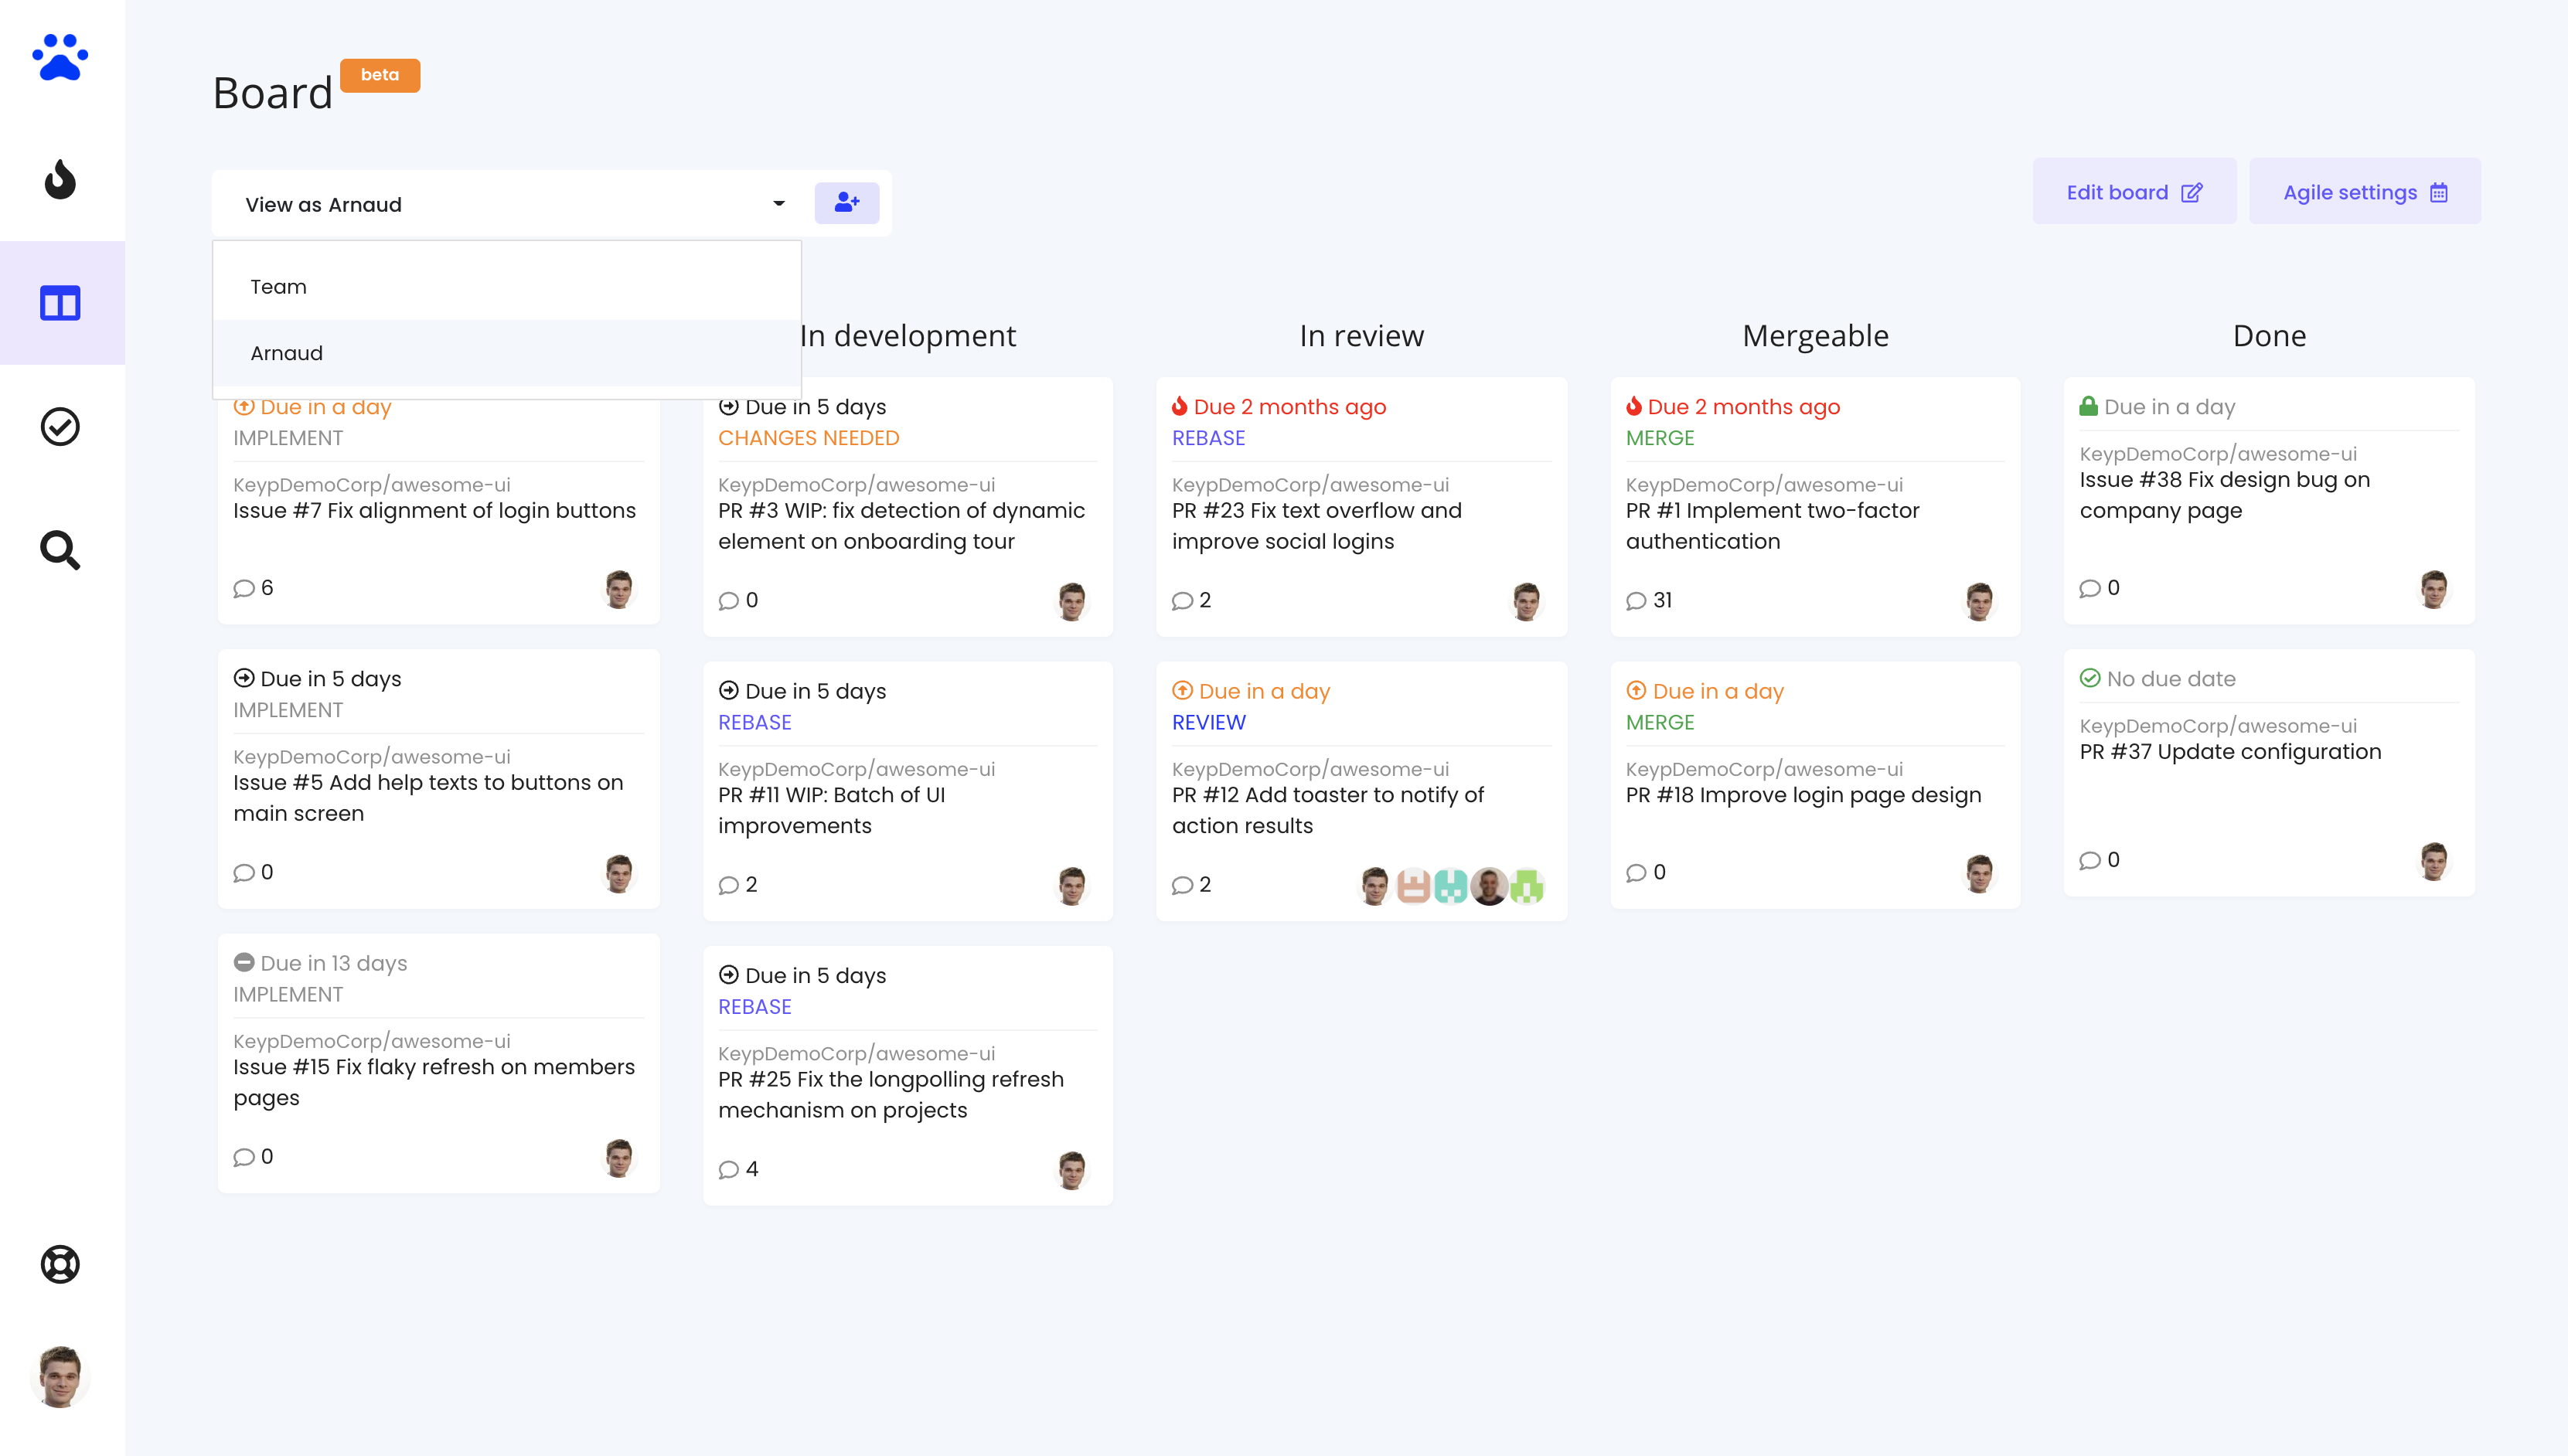 3 prioritization levels - Priority Inbox